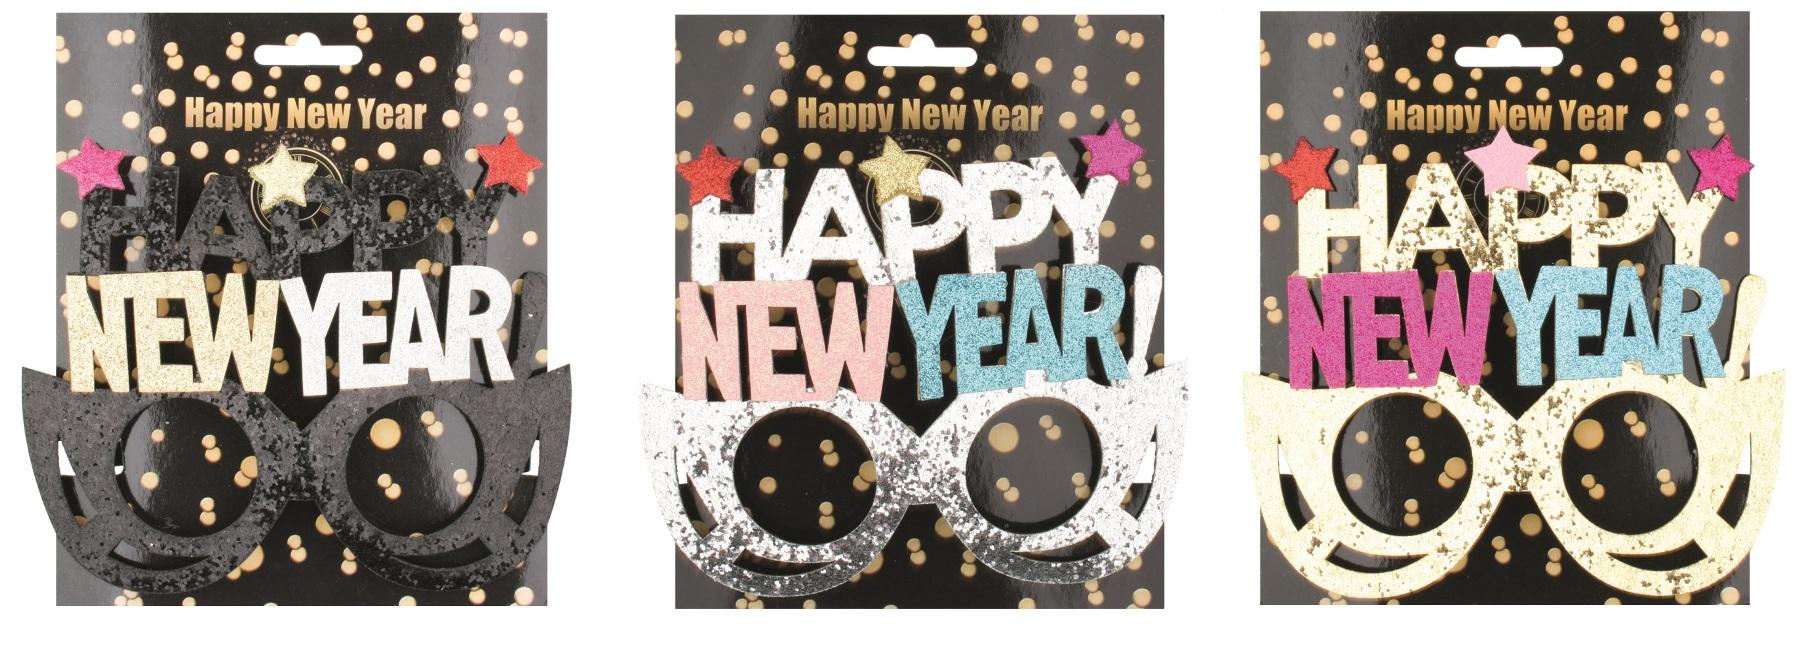 Brýle s nápisem HAPPY NEW YEAR